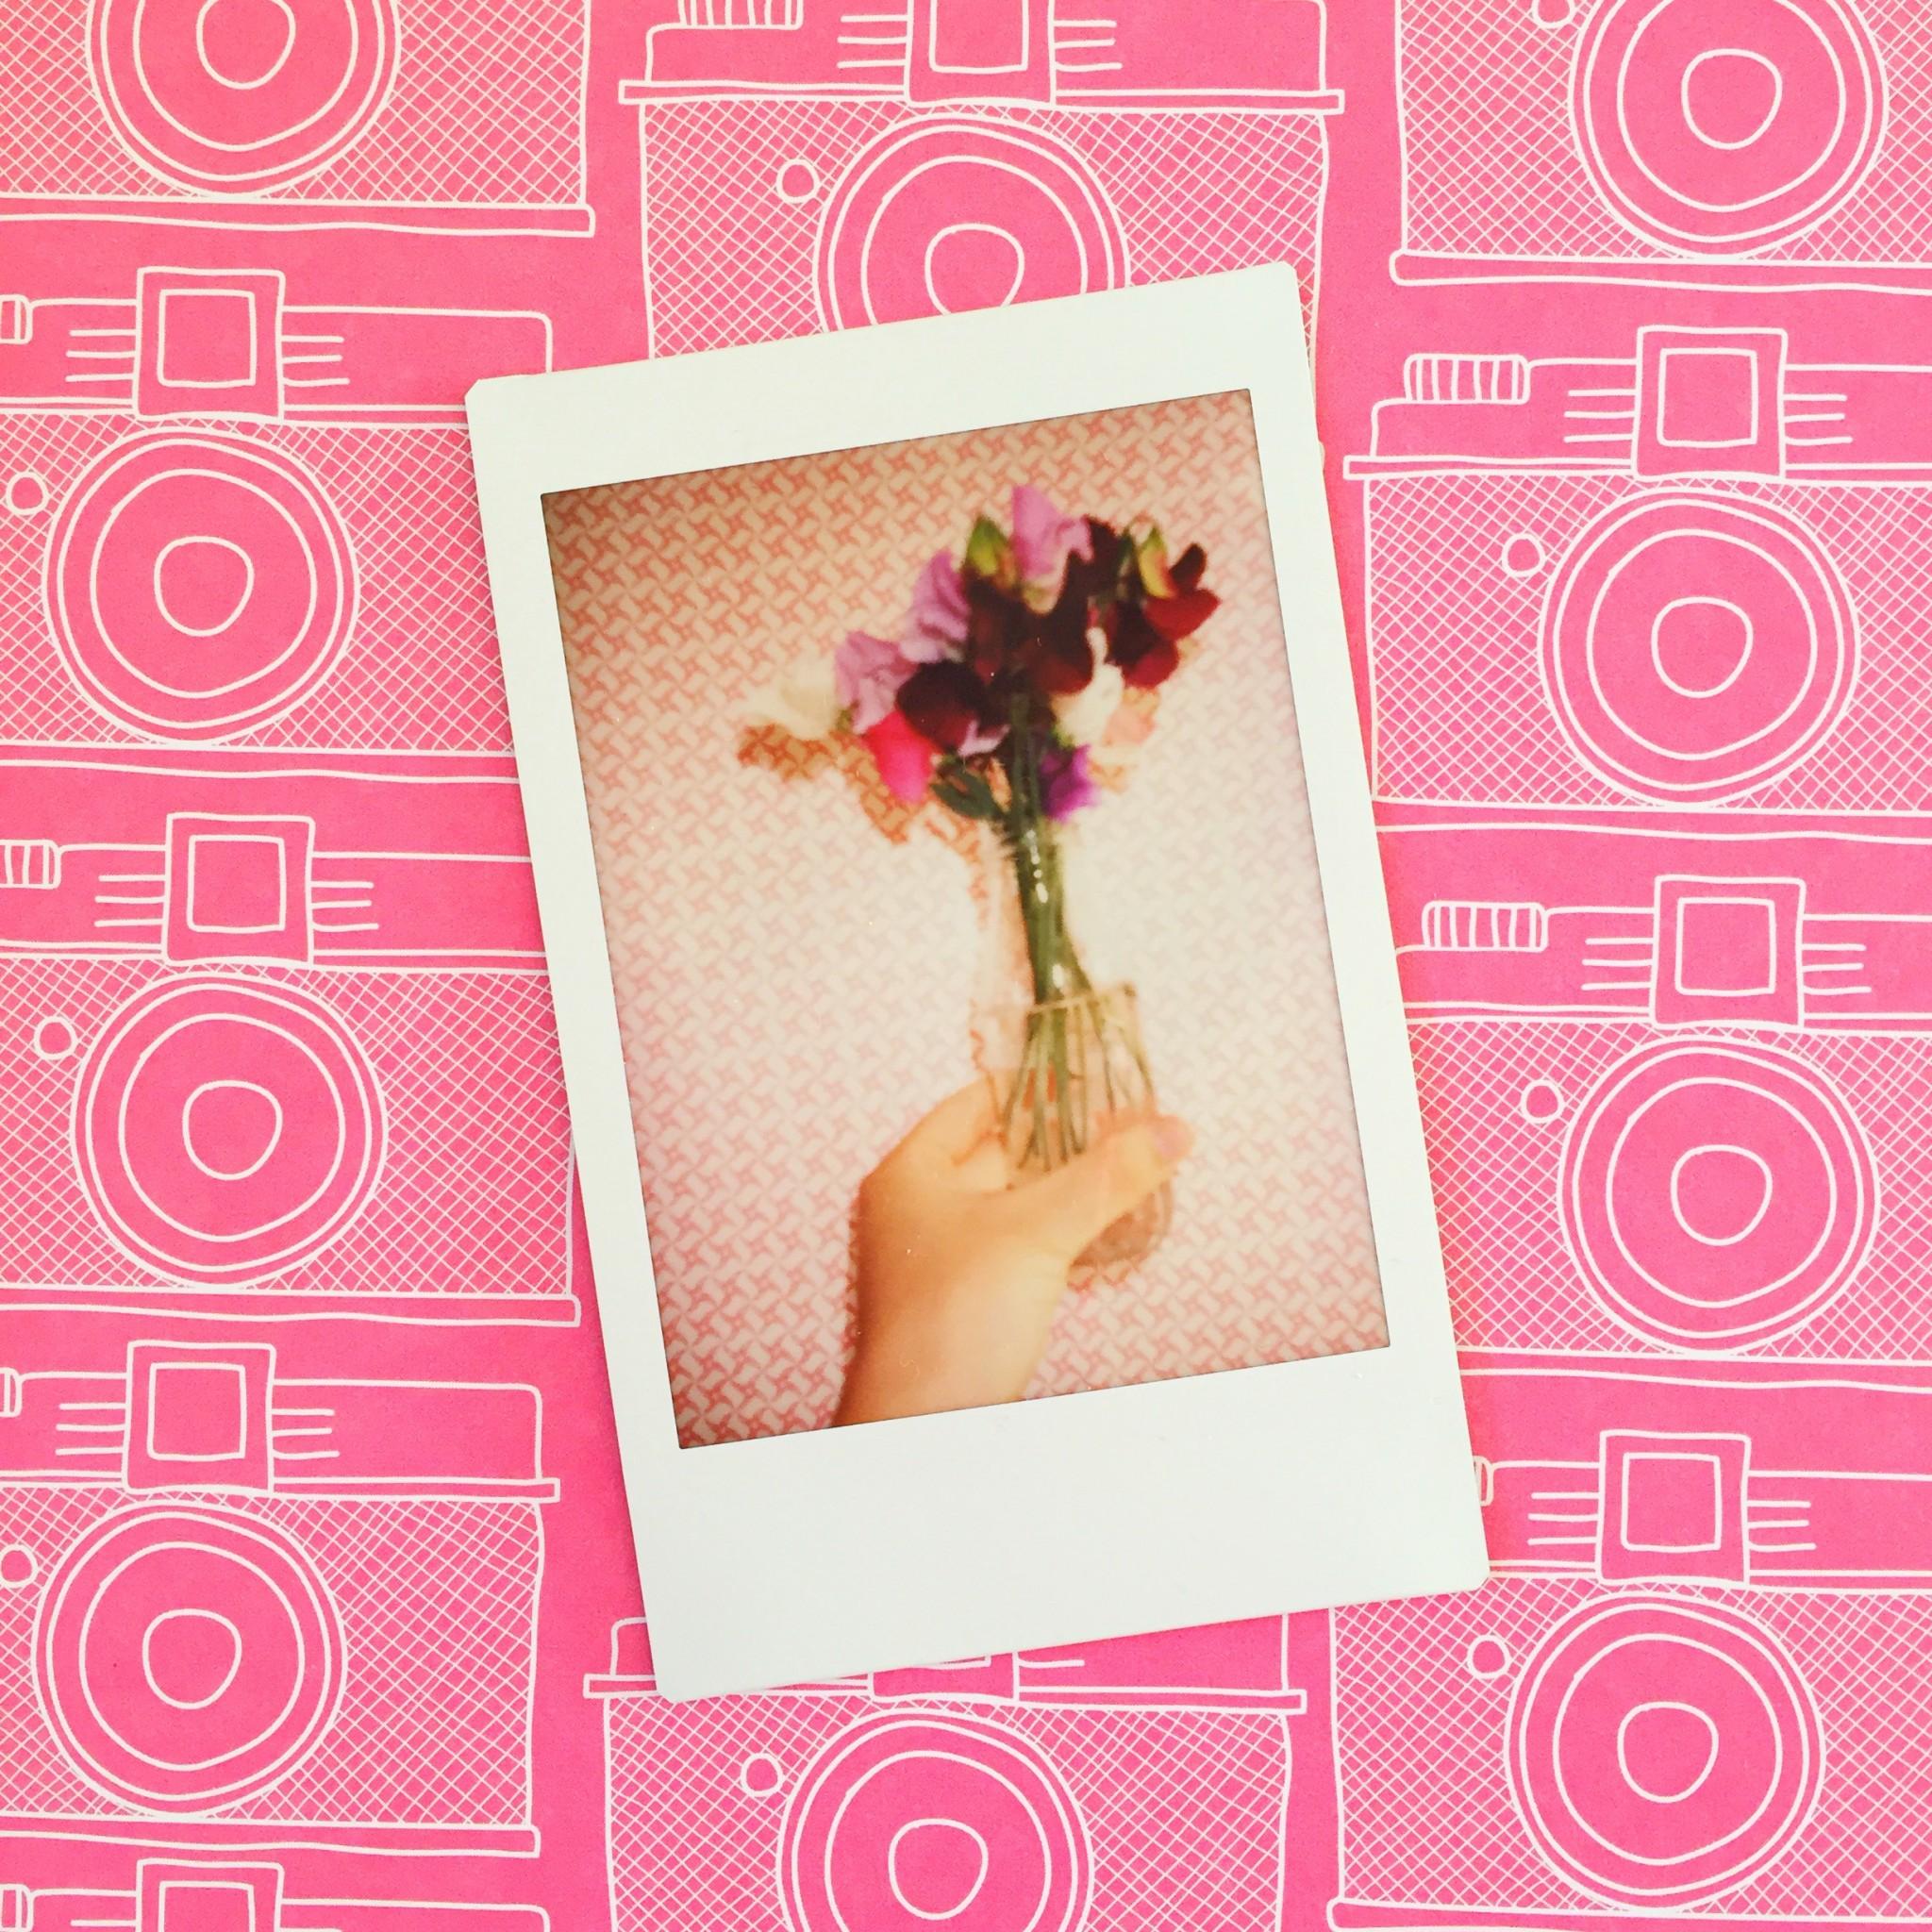 Summer polaroid pictures sweet peas | Hello! Hooray!